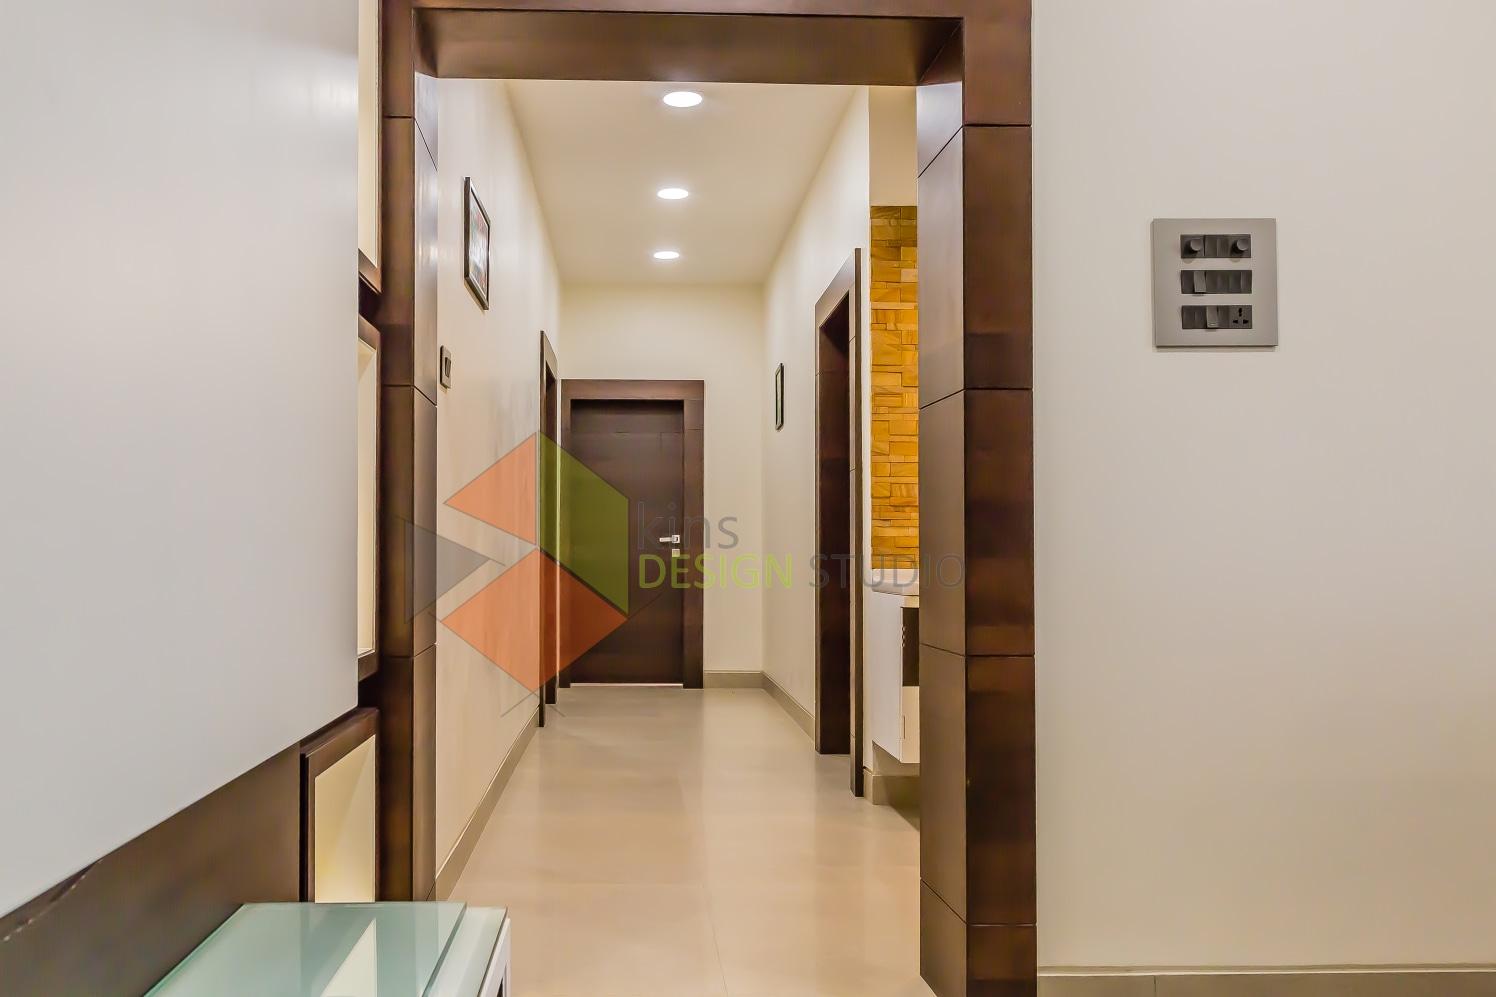 Simplistic Hallway by Kinnera Naresh Indoor-spaces Modern | Interior Design Photos & Ideas